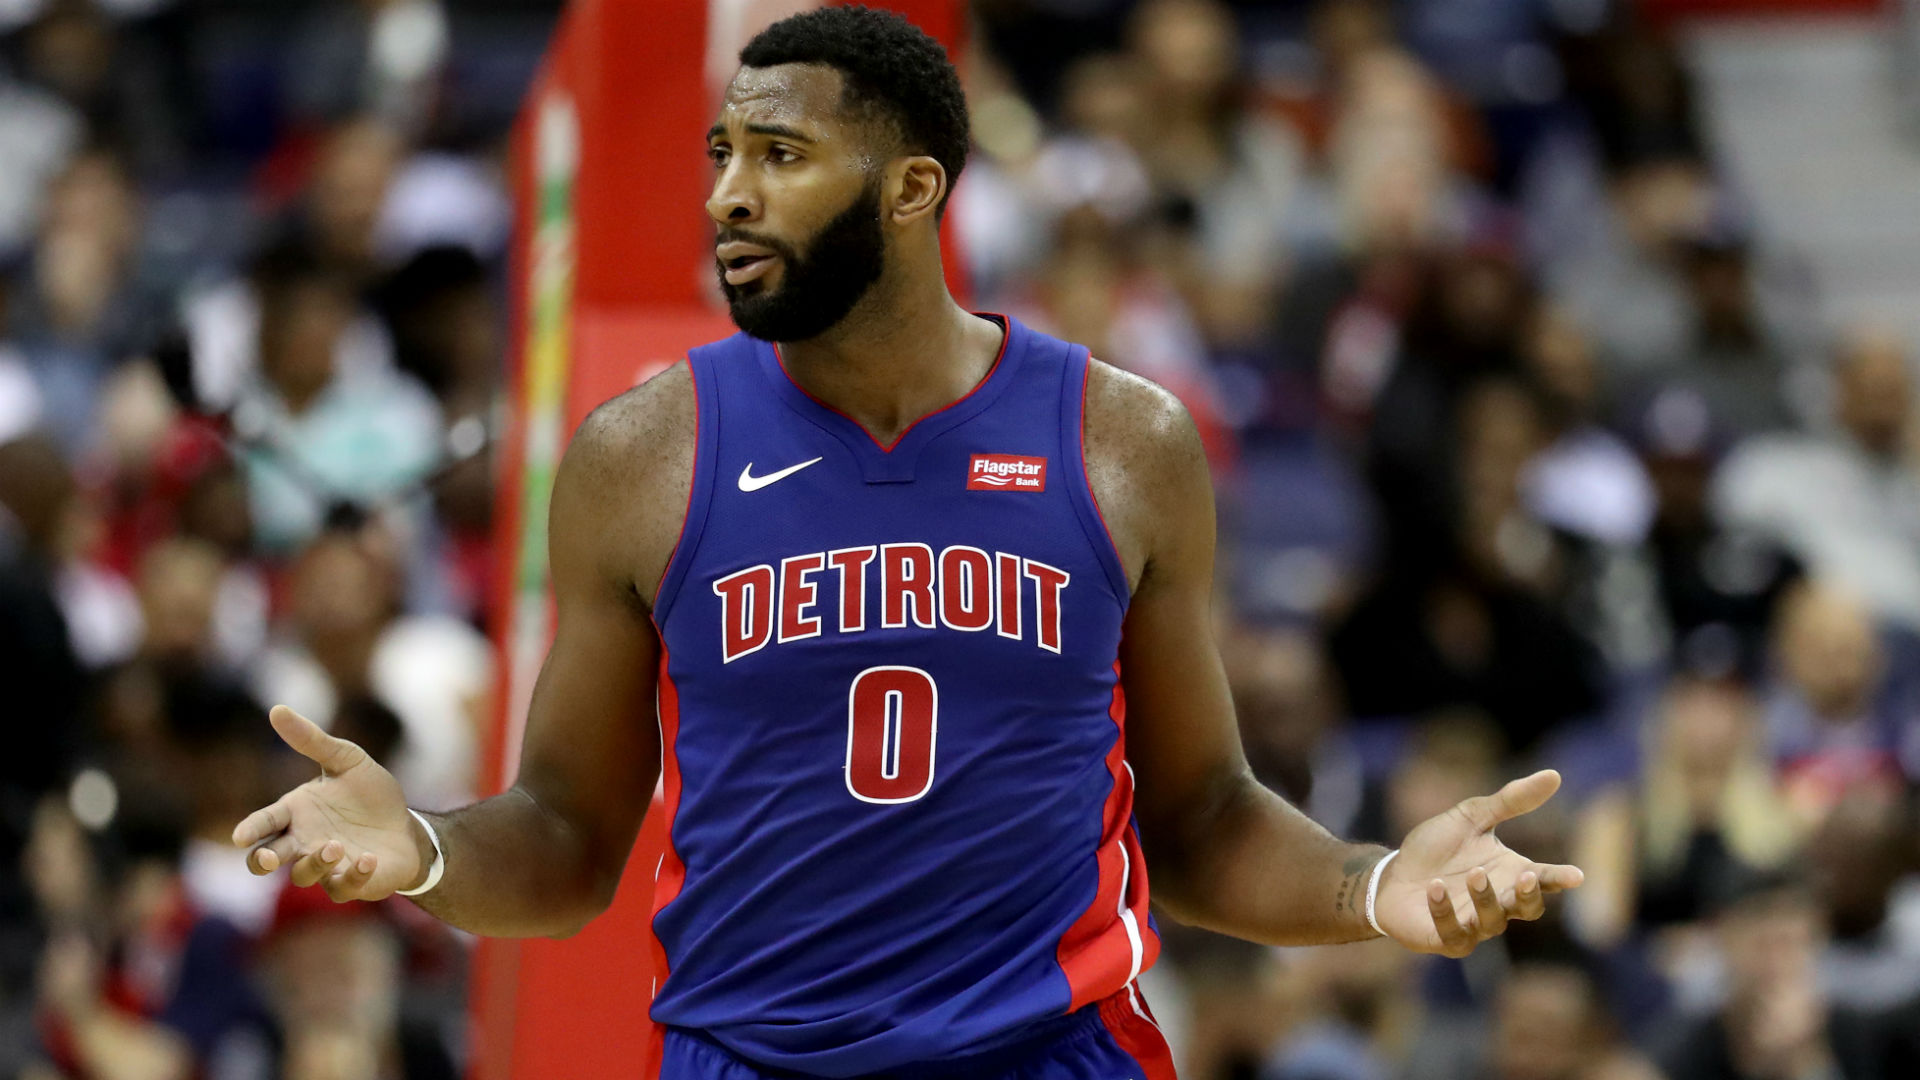 Celtics fall to Pistons